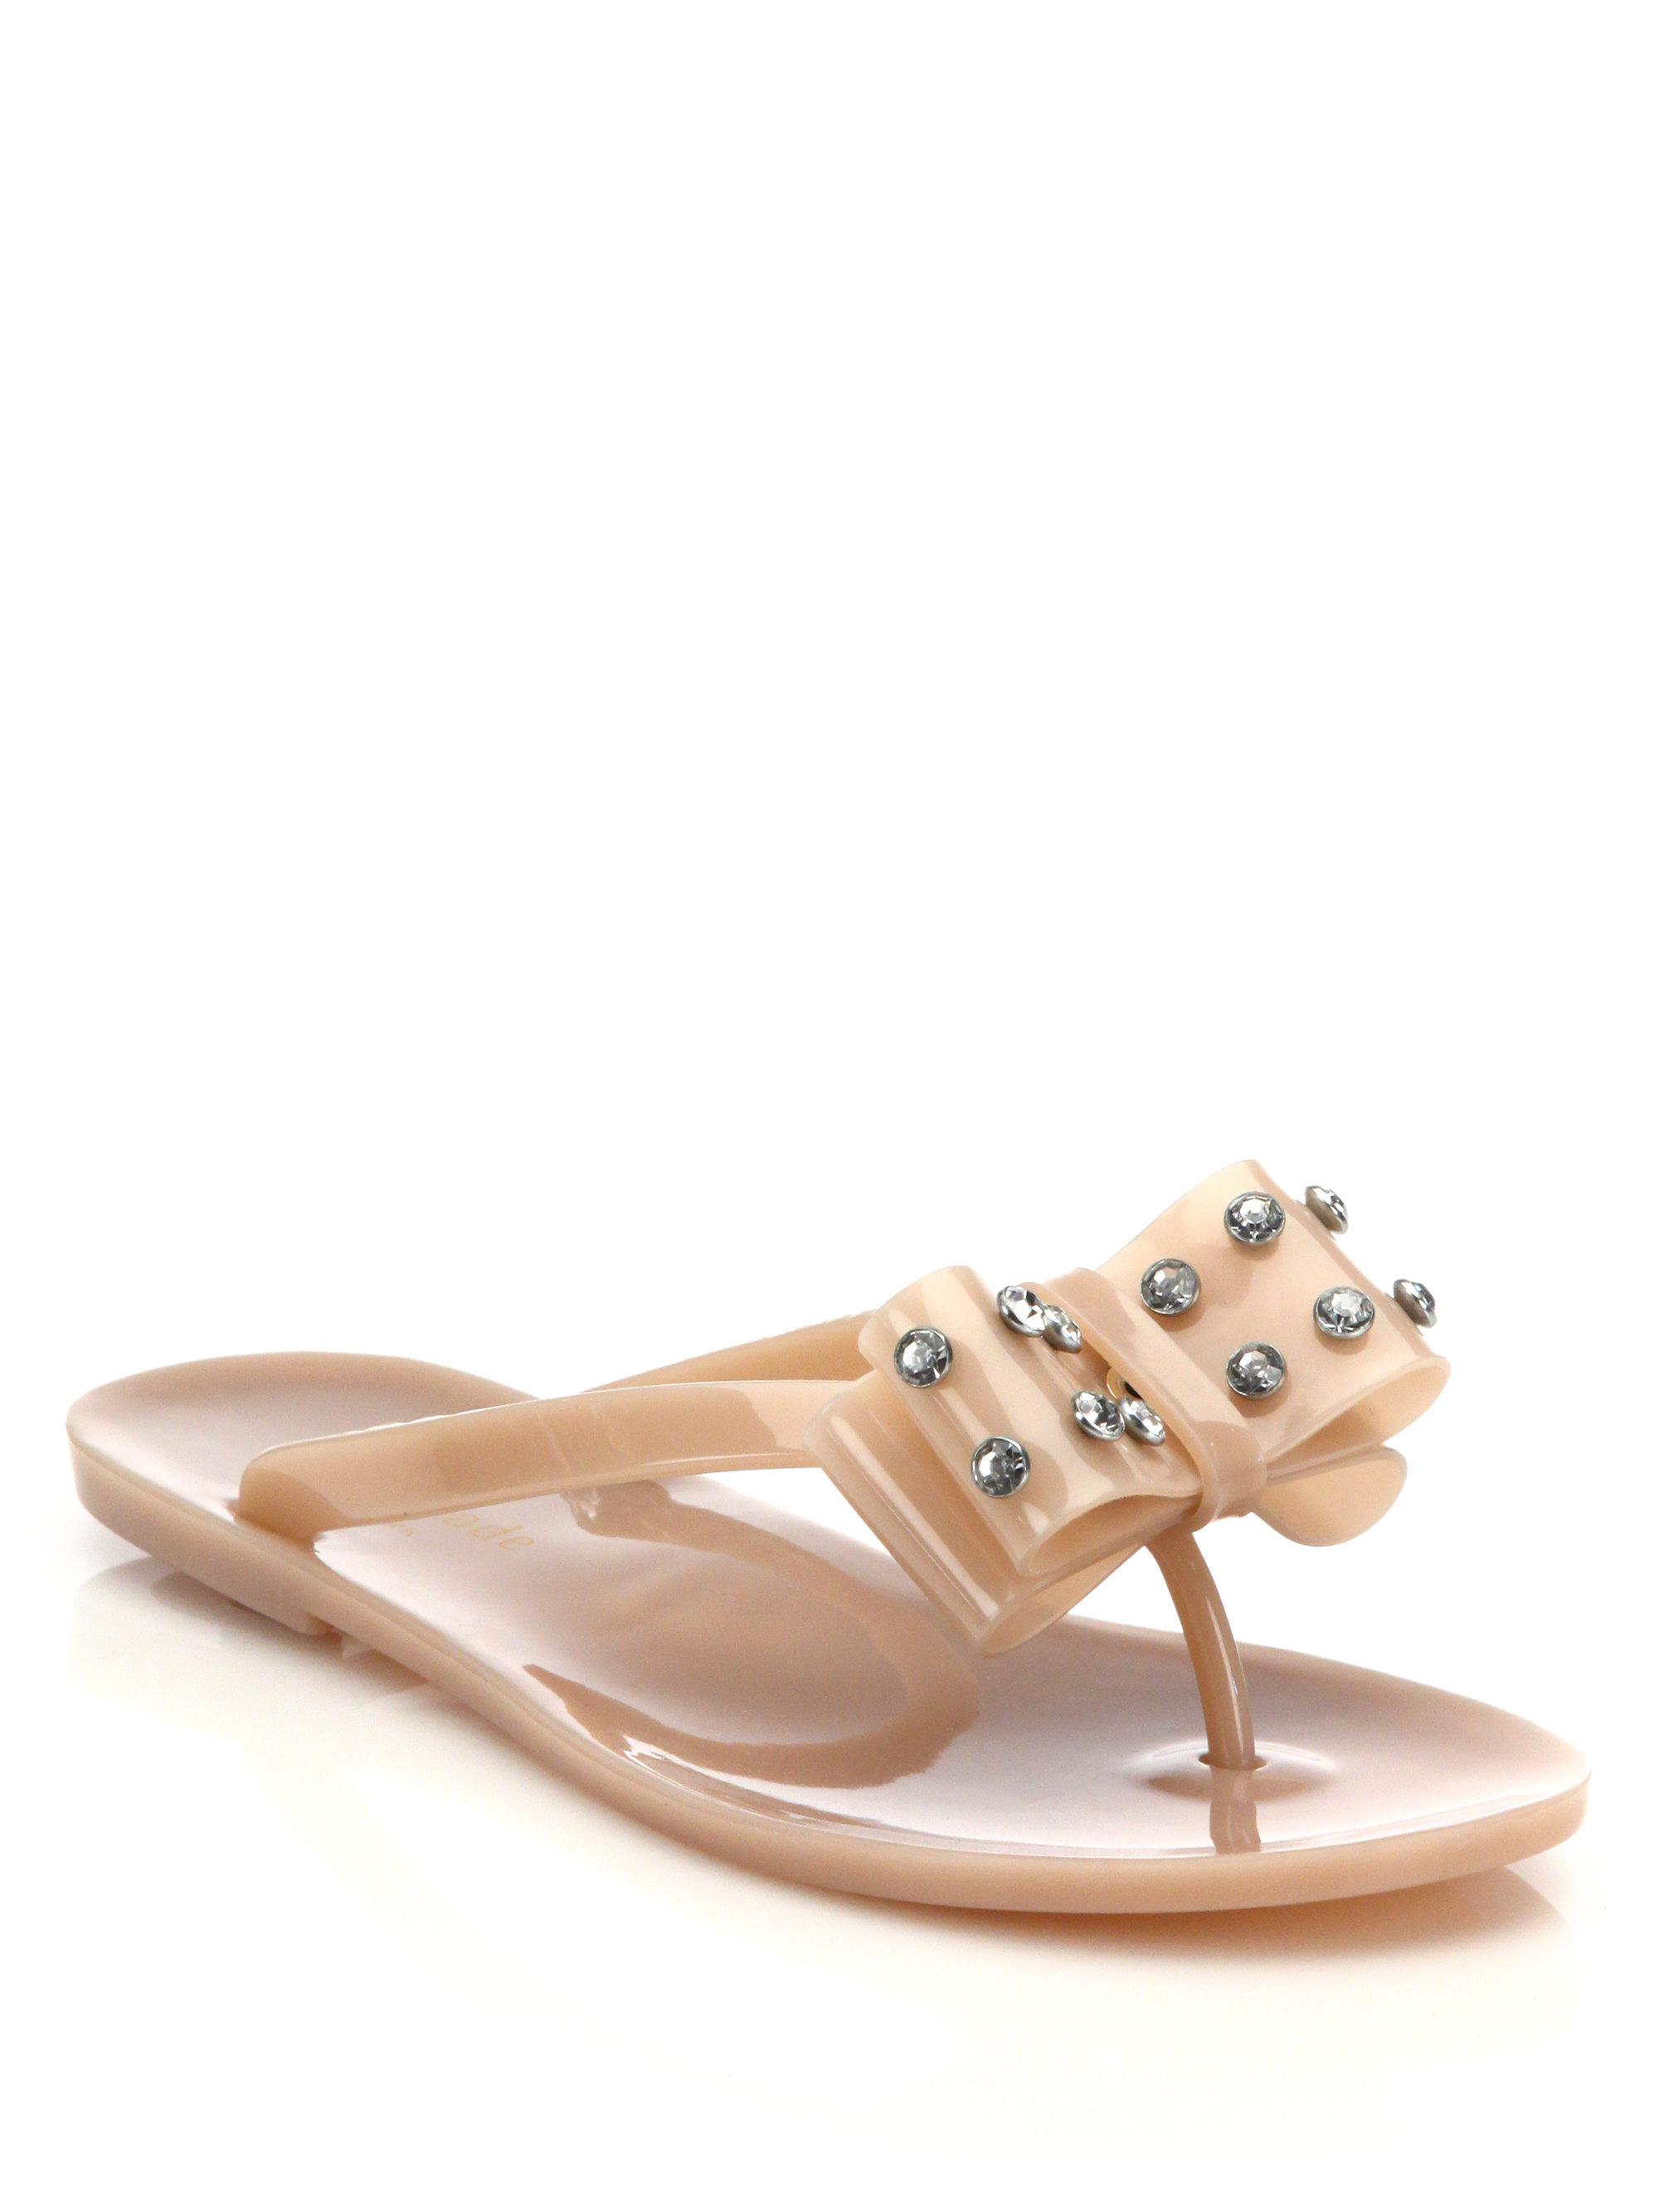 80eae0d6f5c Lyst - Kate Spade France Jelly Flat Sandals in Purple